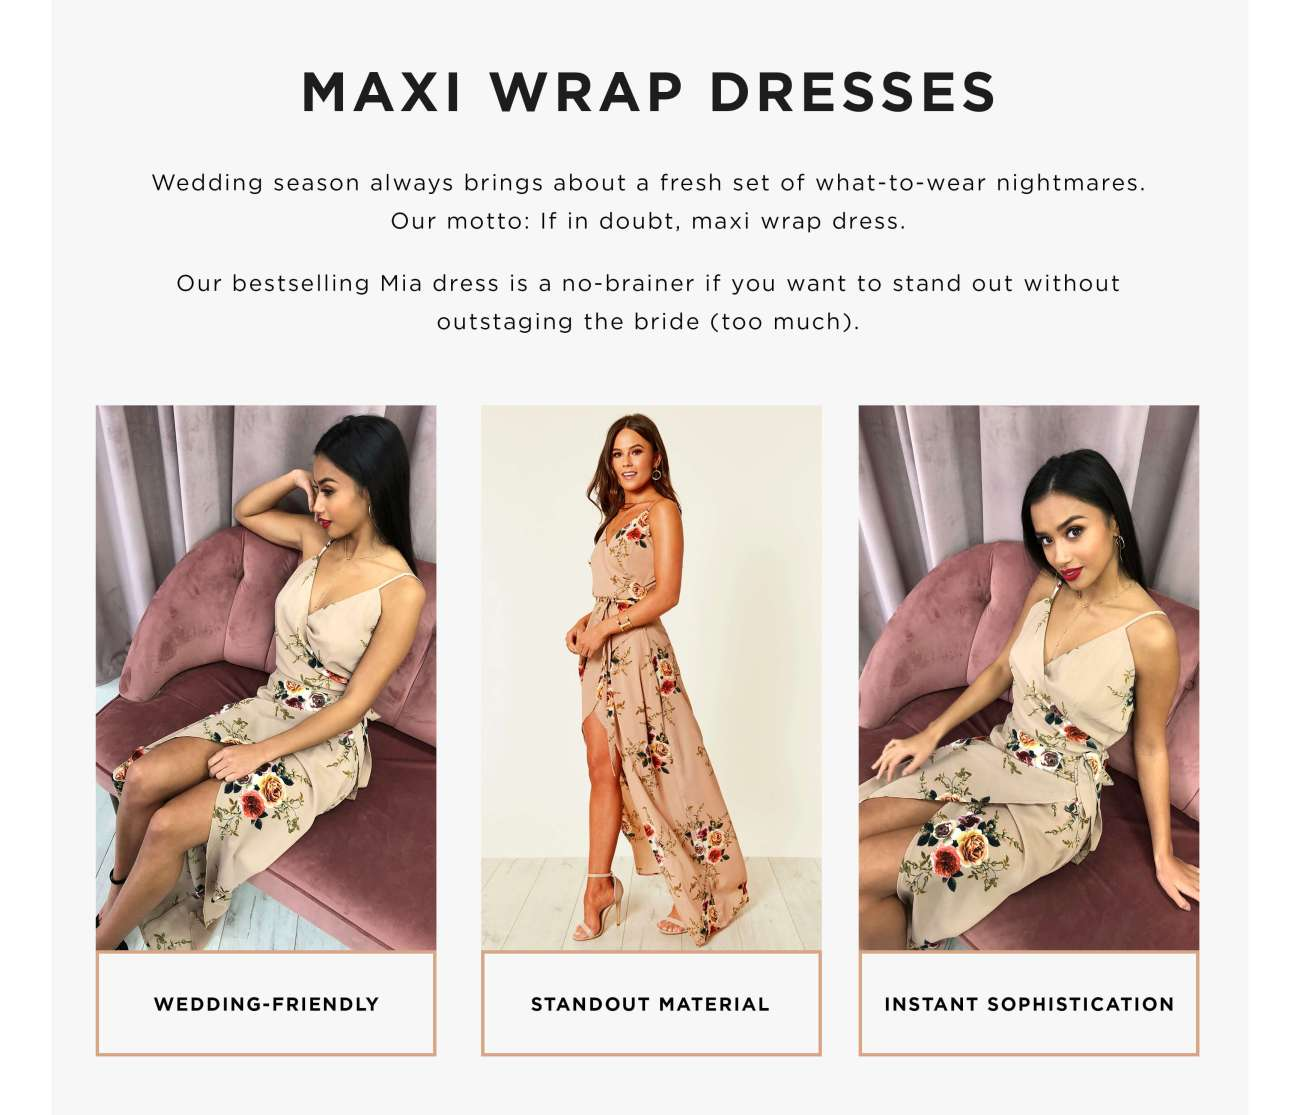 Types of wrap dresses - maxi